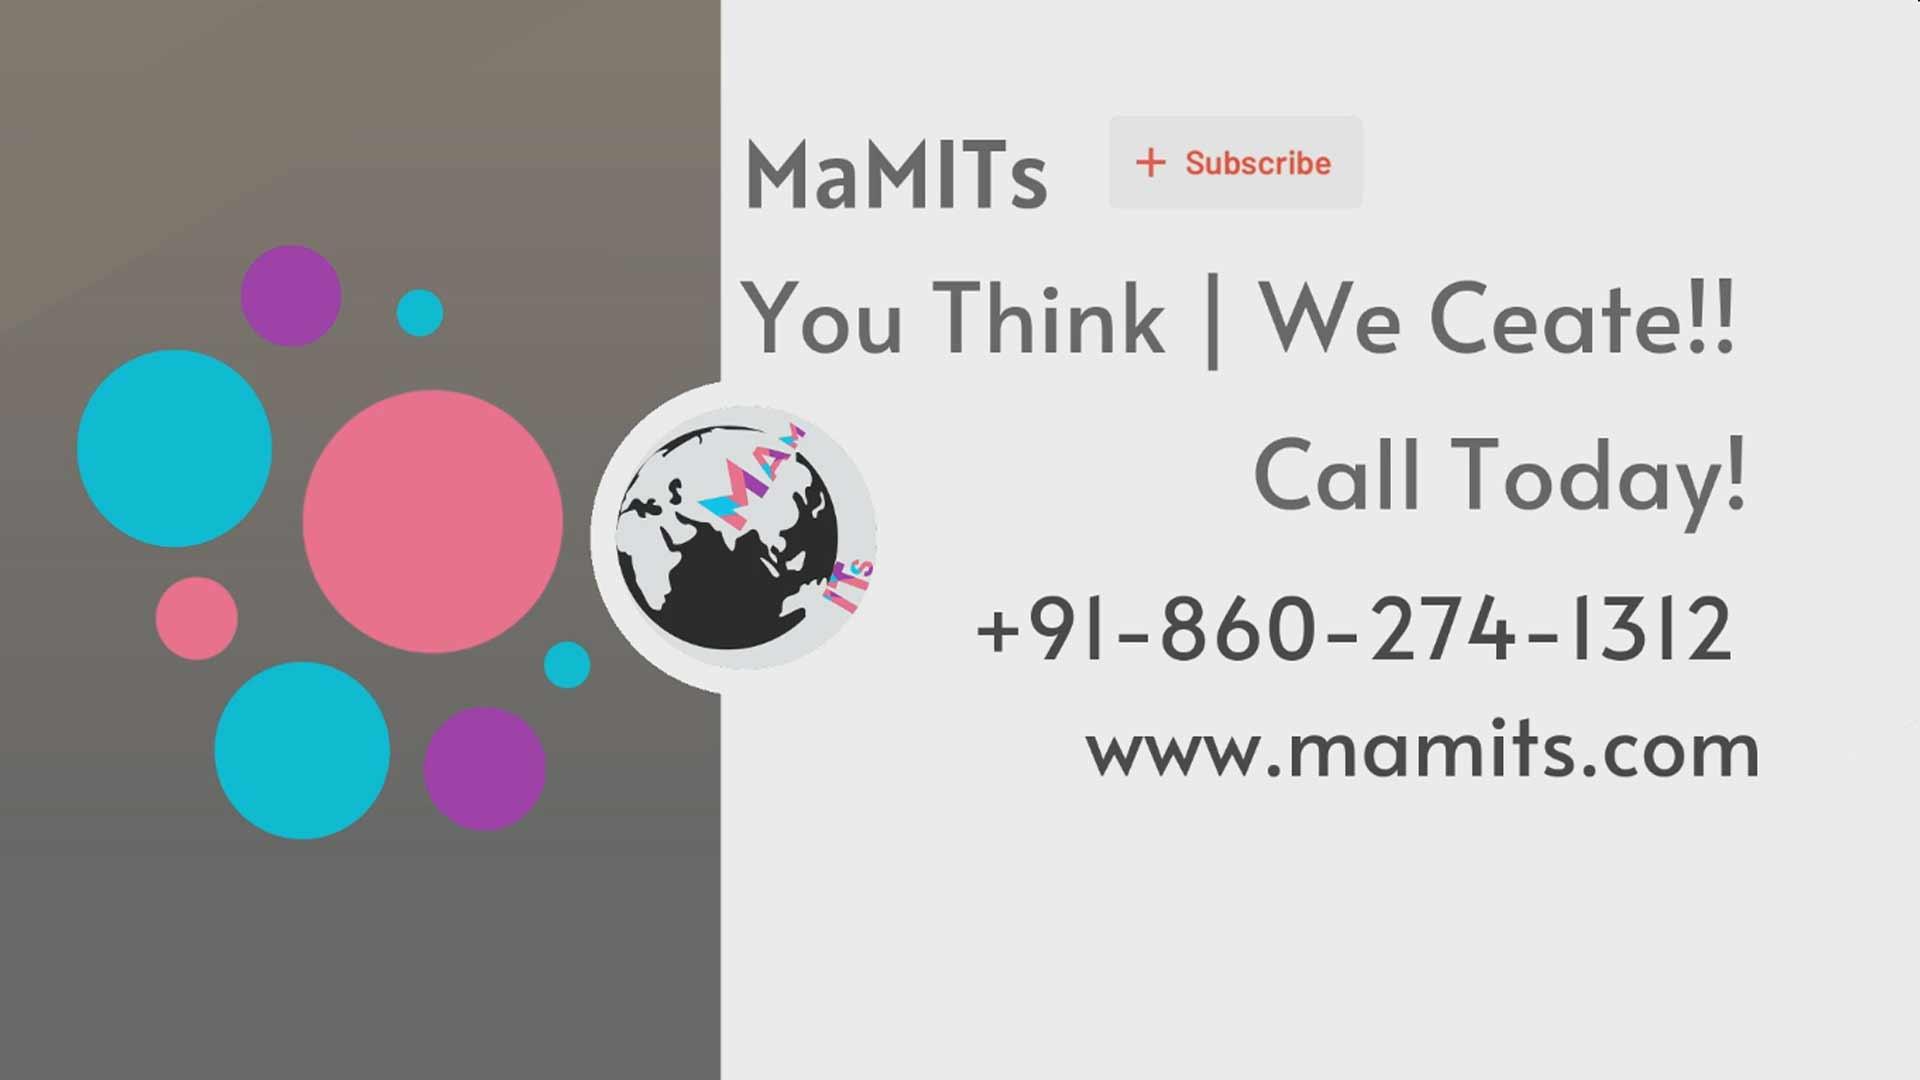 ecommerce website benefit 5 MaMITs